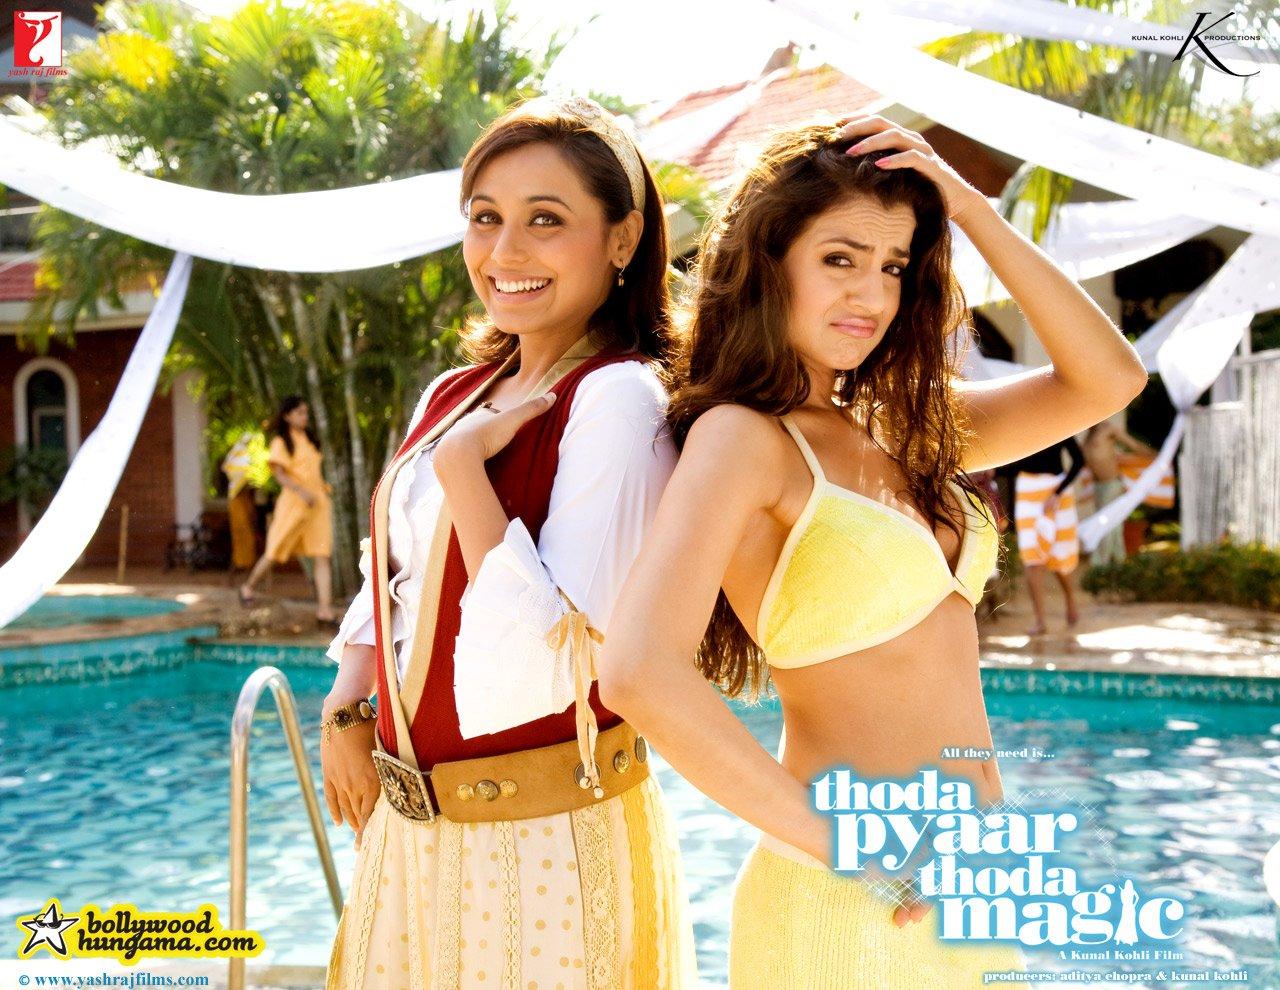 http://i.indiafm.com/posters/movies/08/thodapyaarthodamagic/still14.jpg